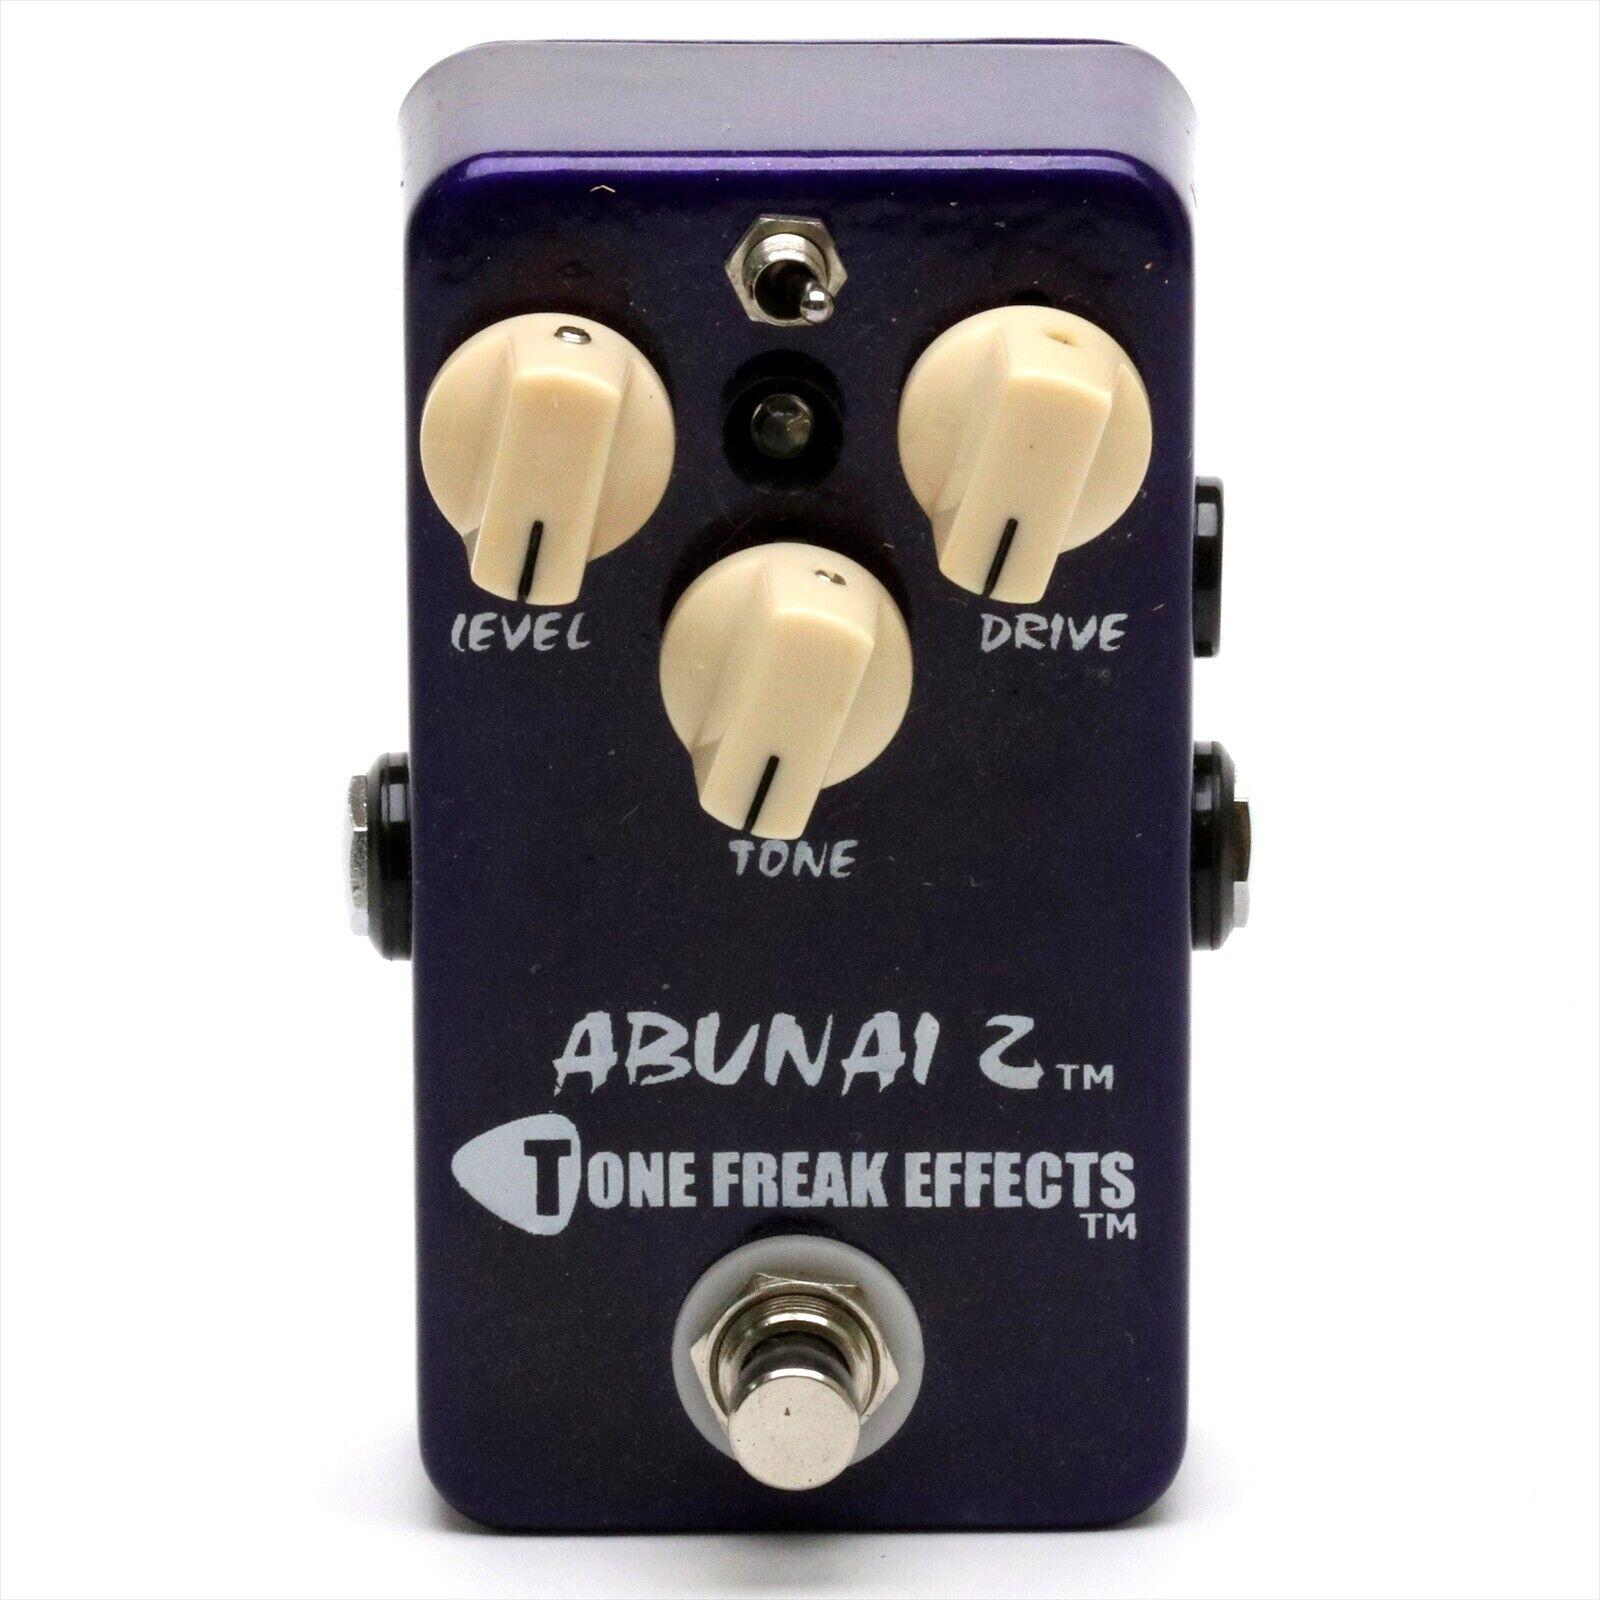 TONE FREAK EFFECTS ABUNAI 2 Guitar Effect Pedal Made in USA